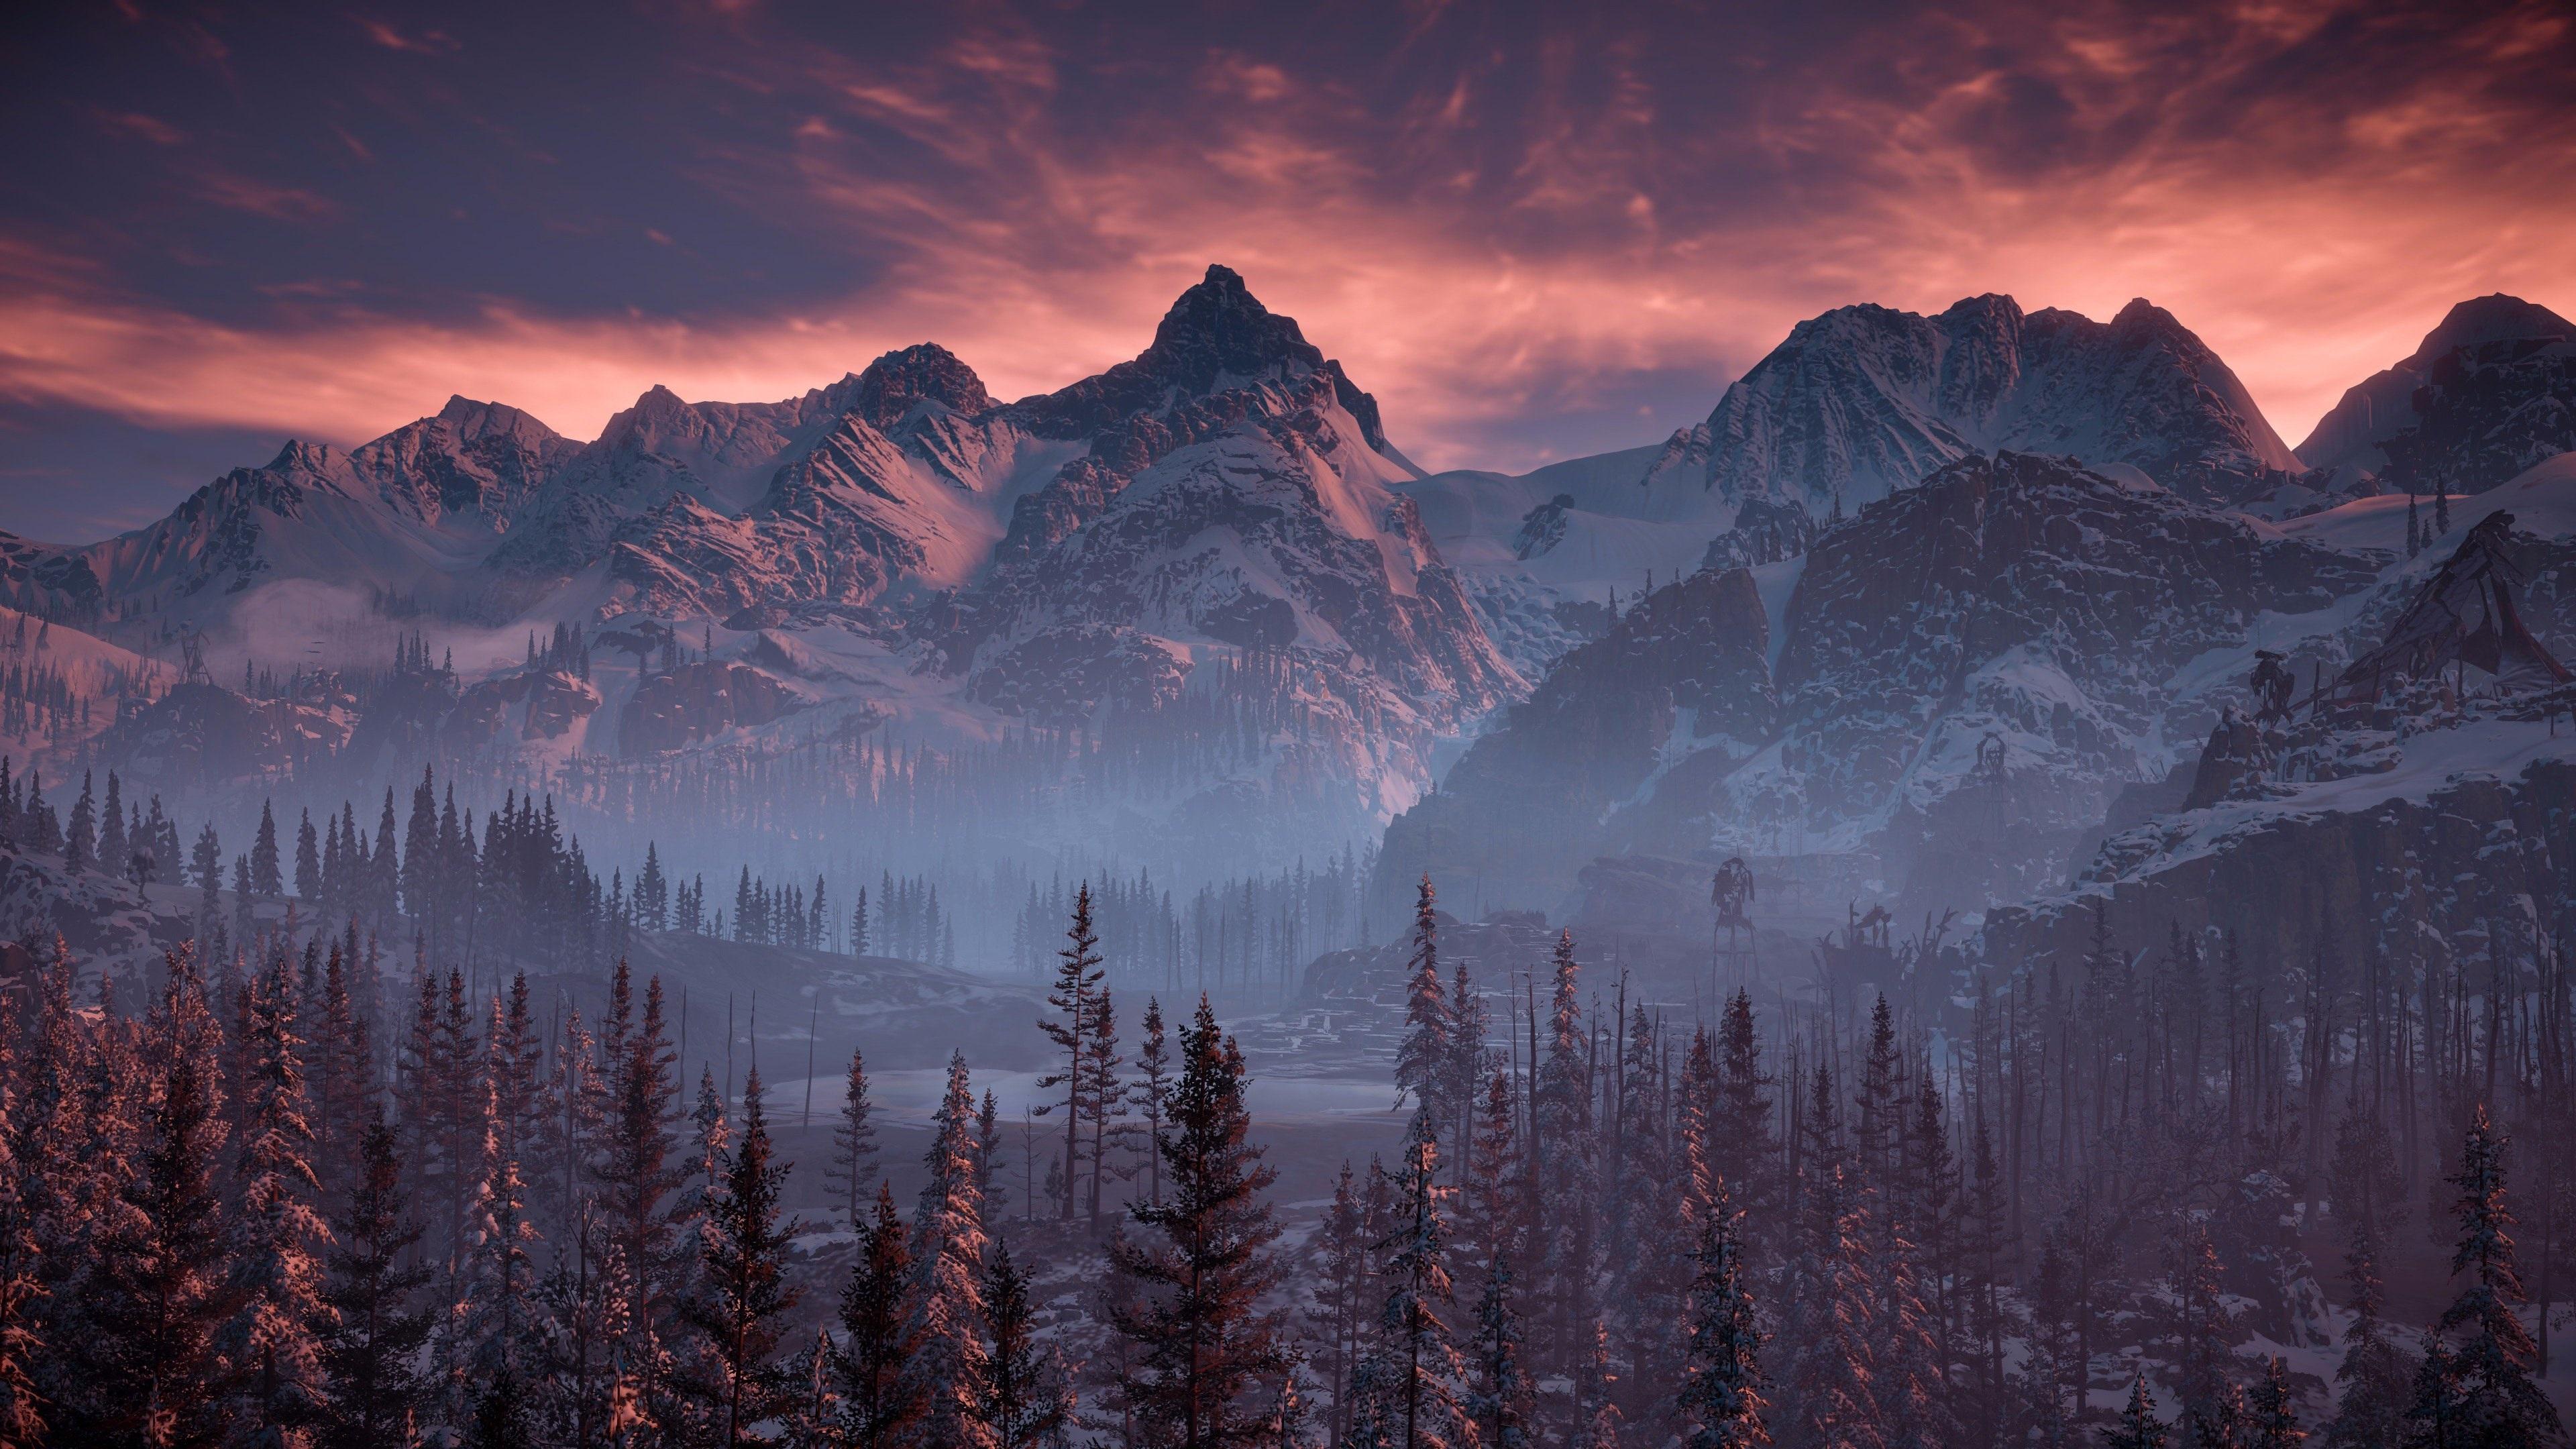 Horizon Zero Dawn Mountains , HD Wallpaper & Backgrounds